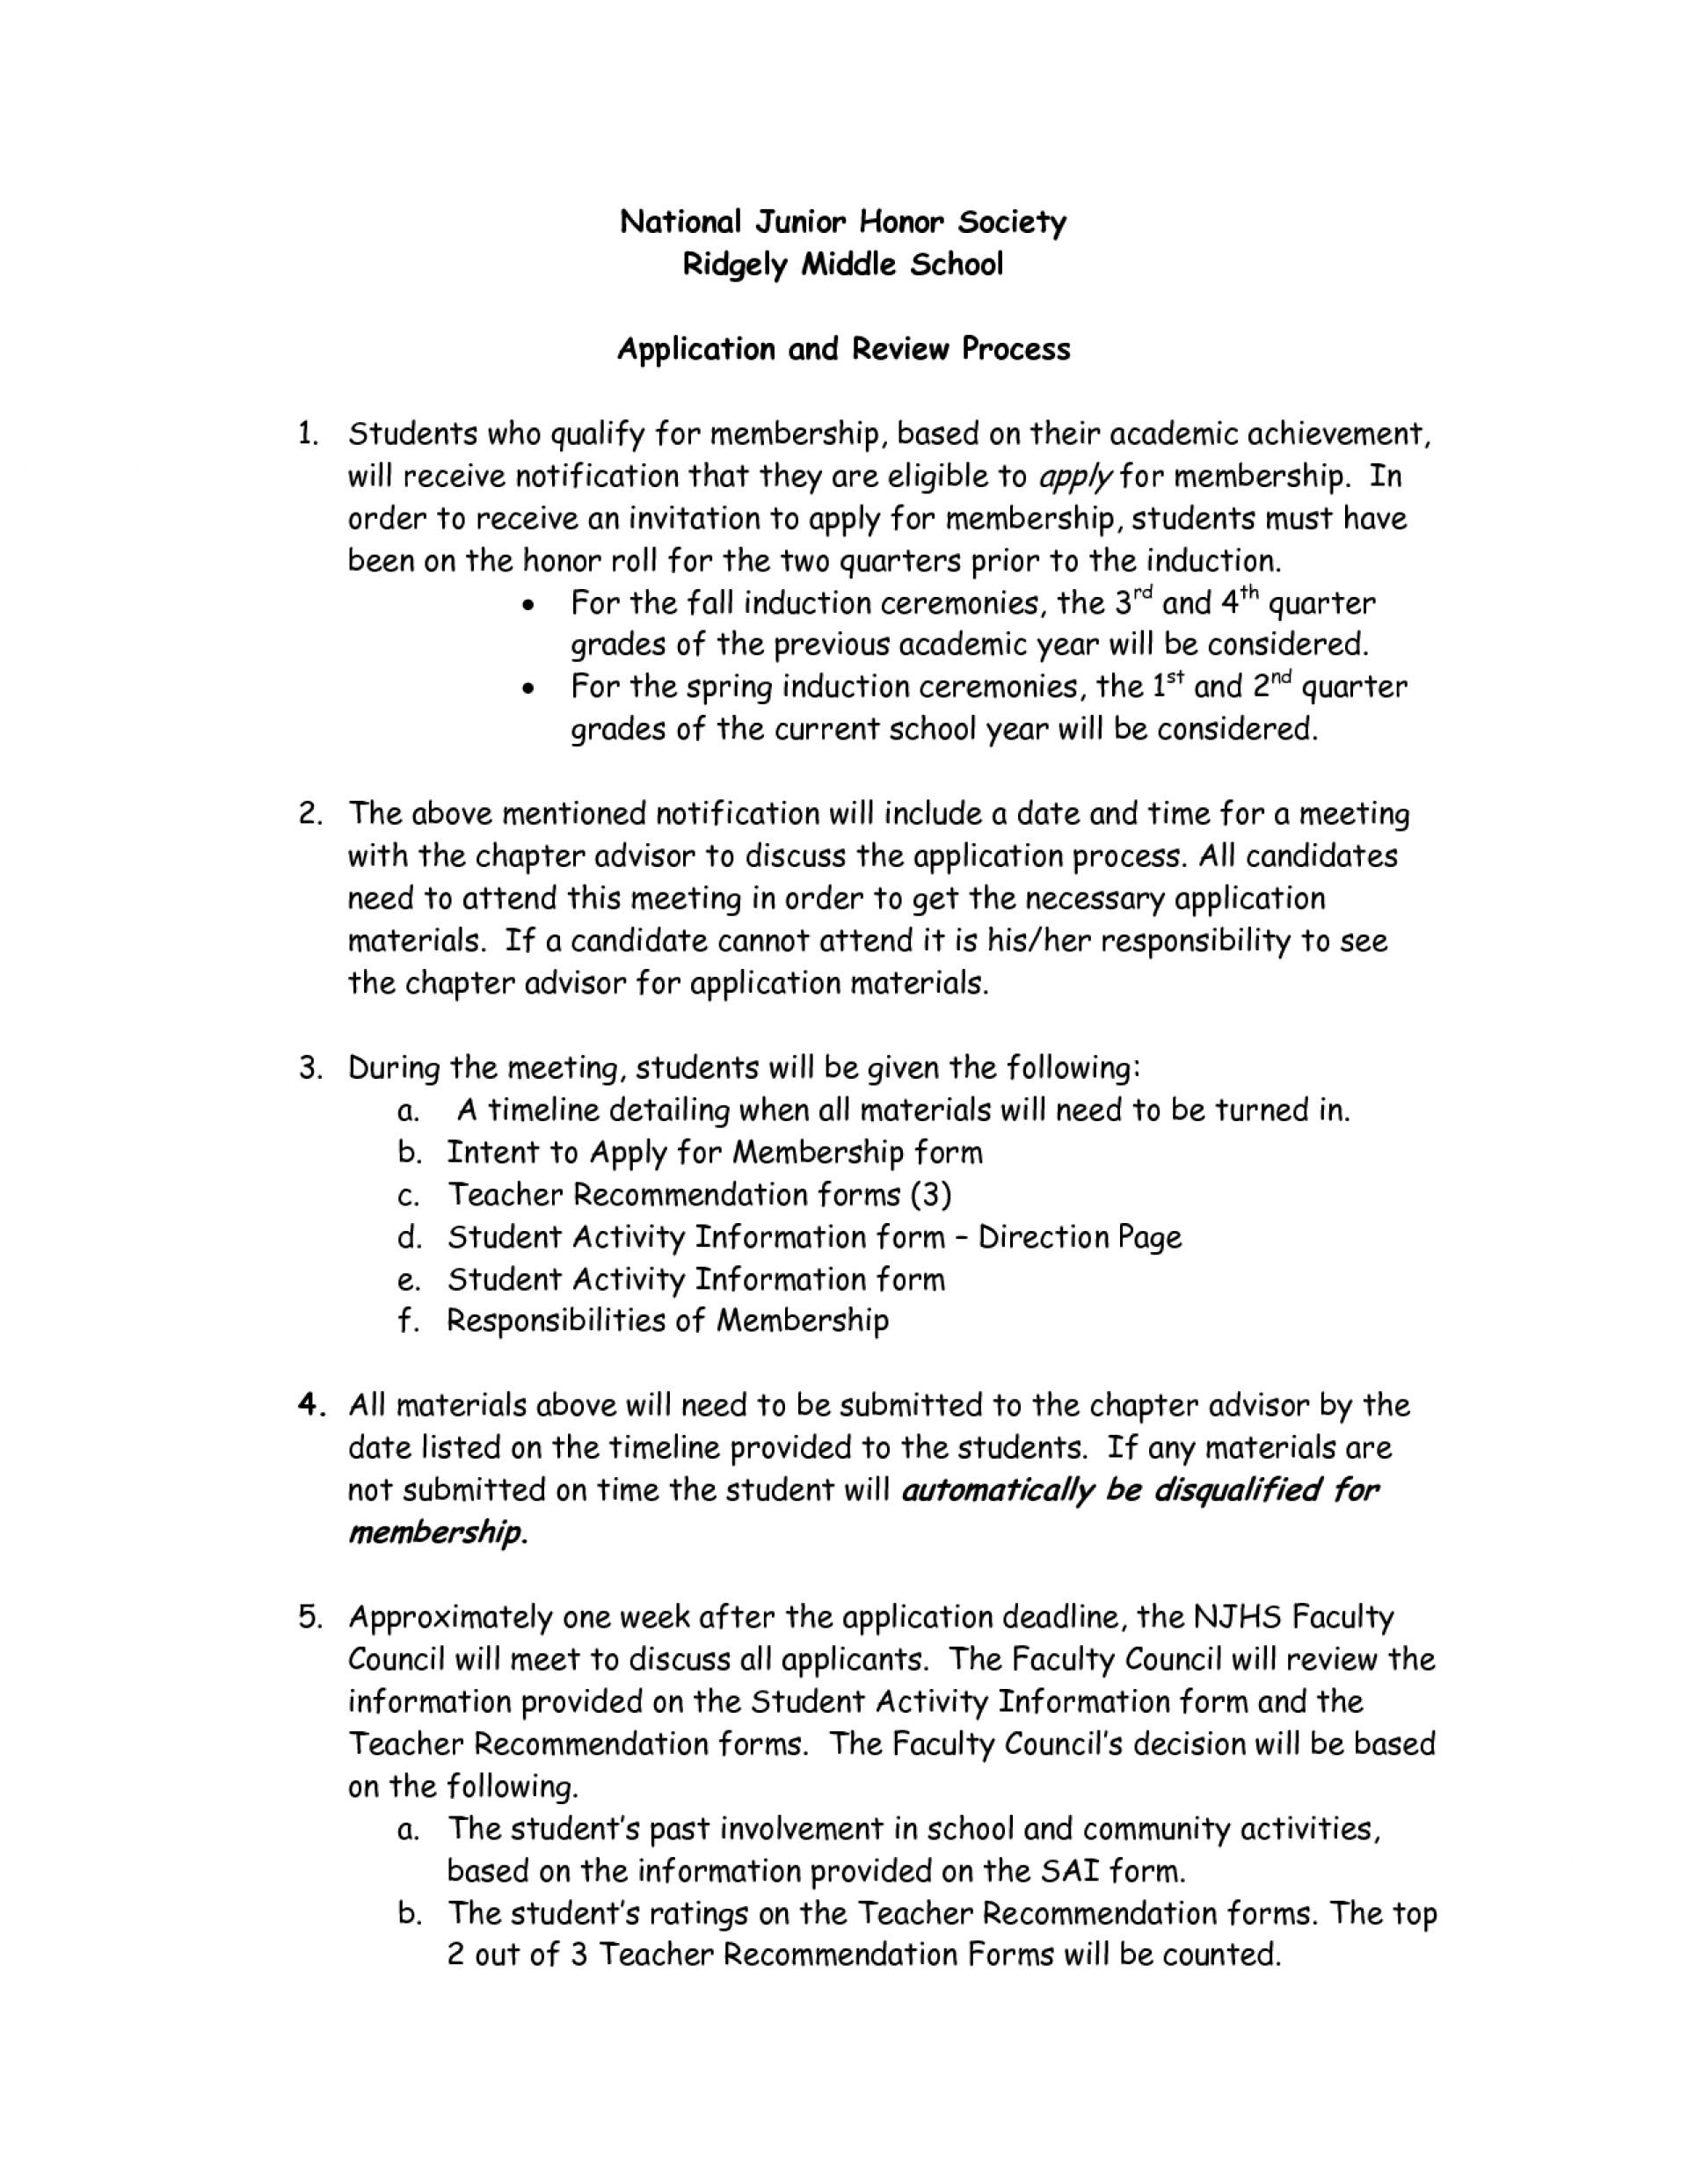 025 National Honor Society Application Essay Example Honors Examples Of Junior Sensational Service Scholarship 1920